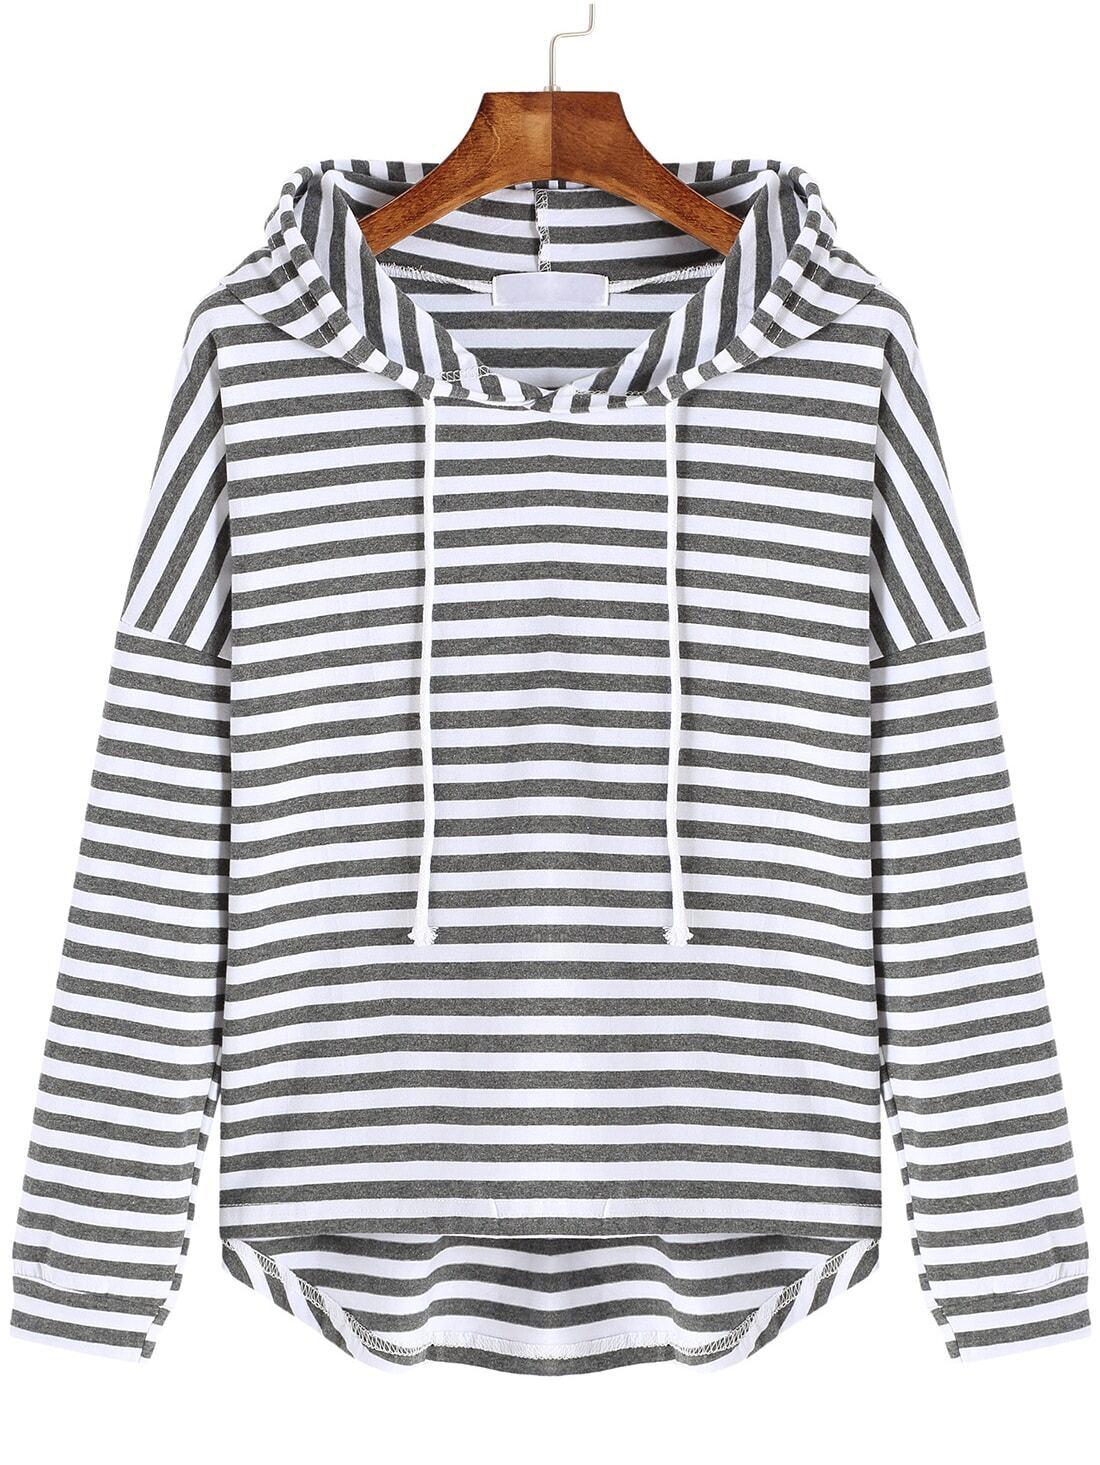 Grey White Hooded Long Sleeve Striped Sweatshirtfor Women